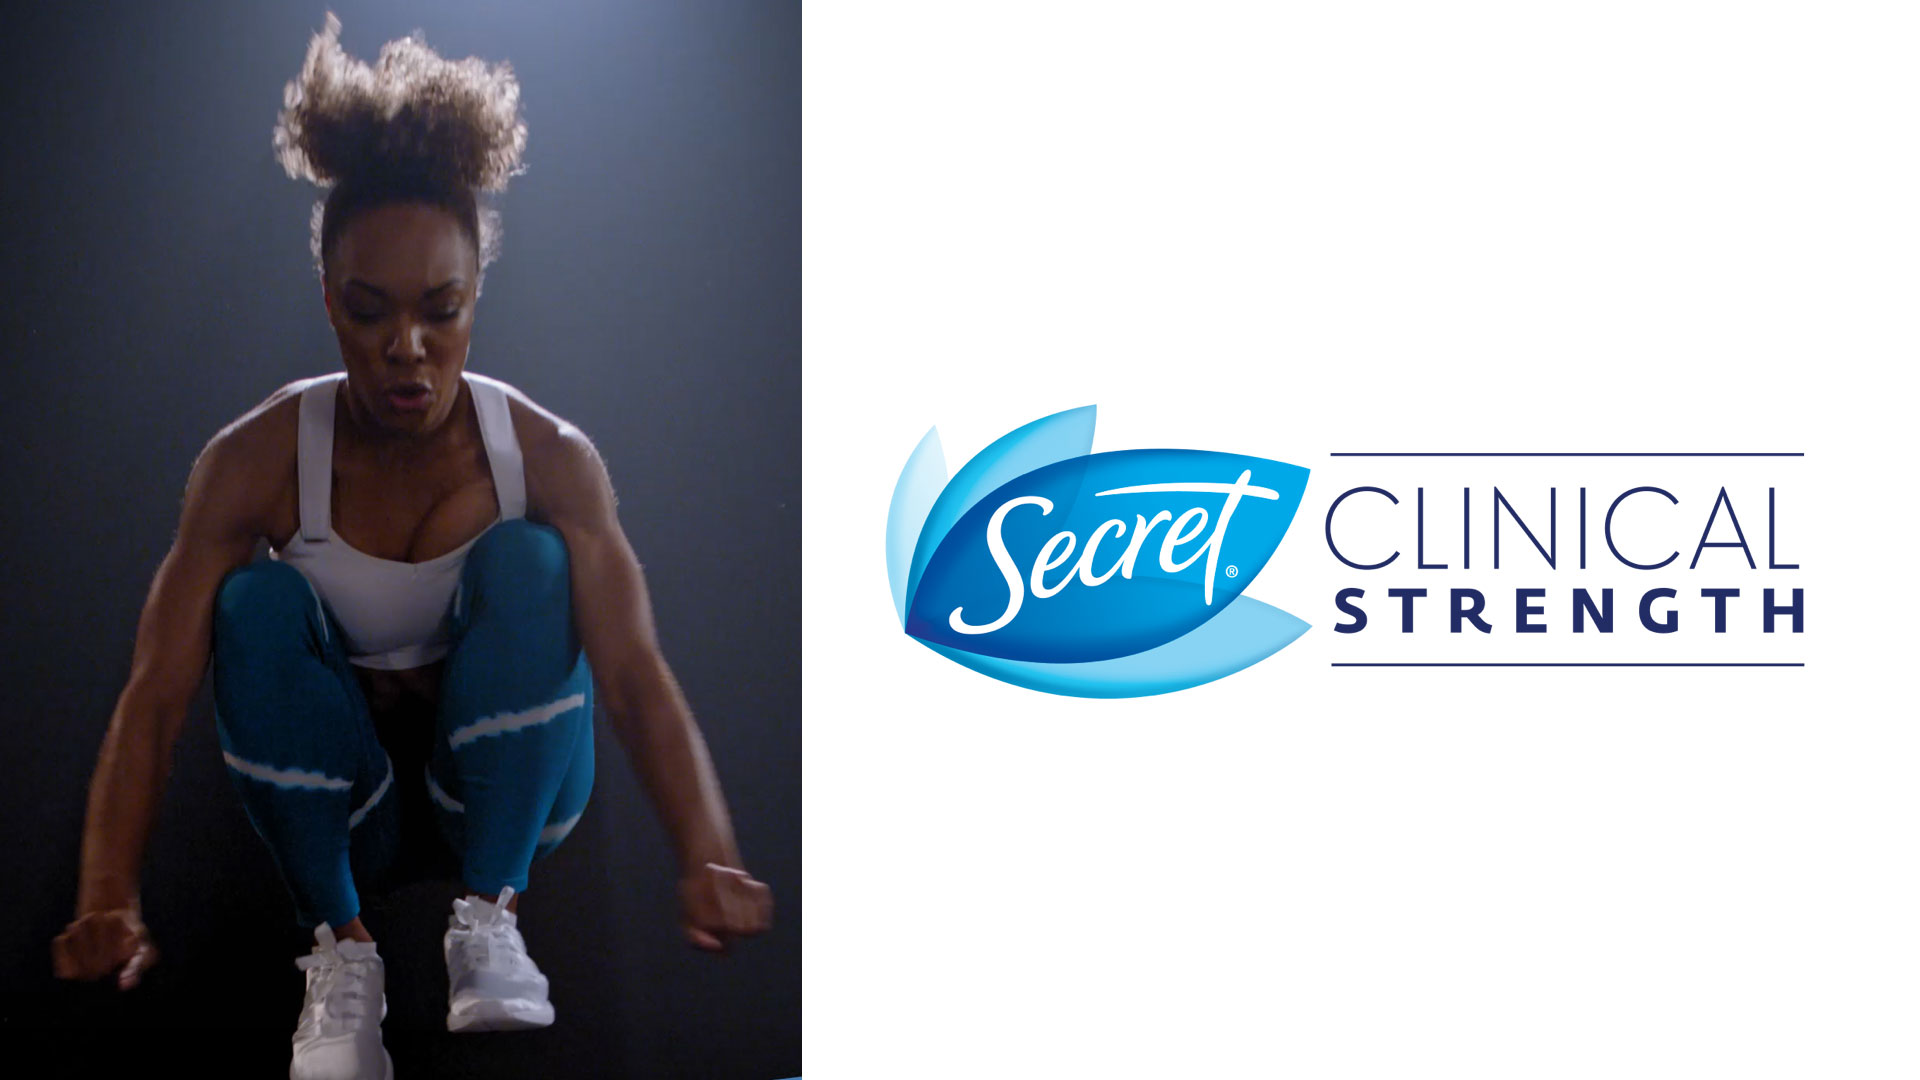 Secret - Crossfit - 1920 x 1080 - Thumbnail.jpg